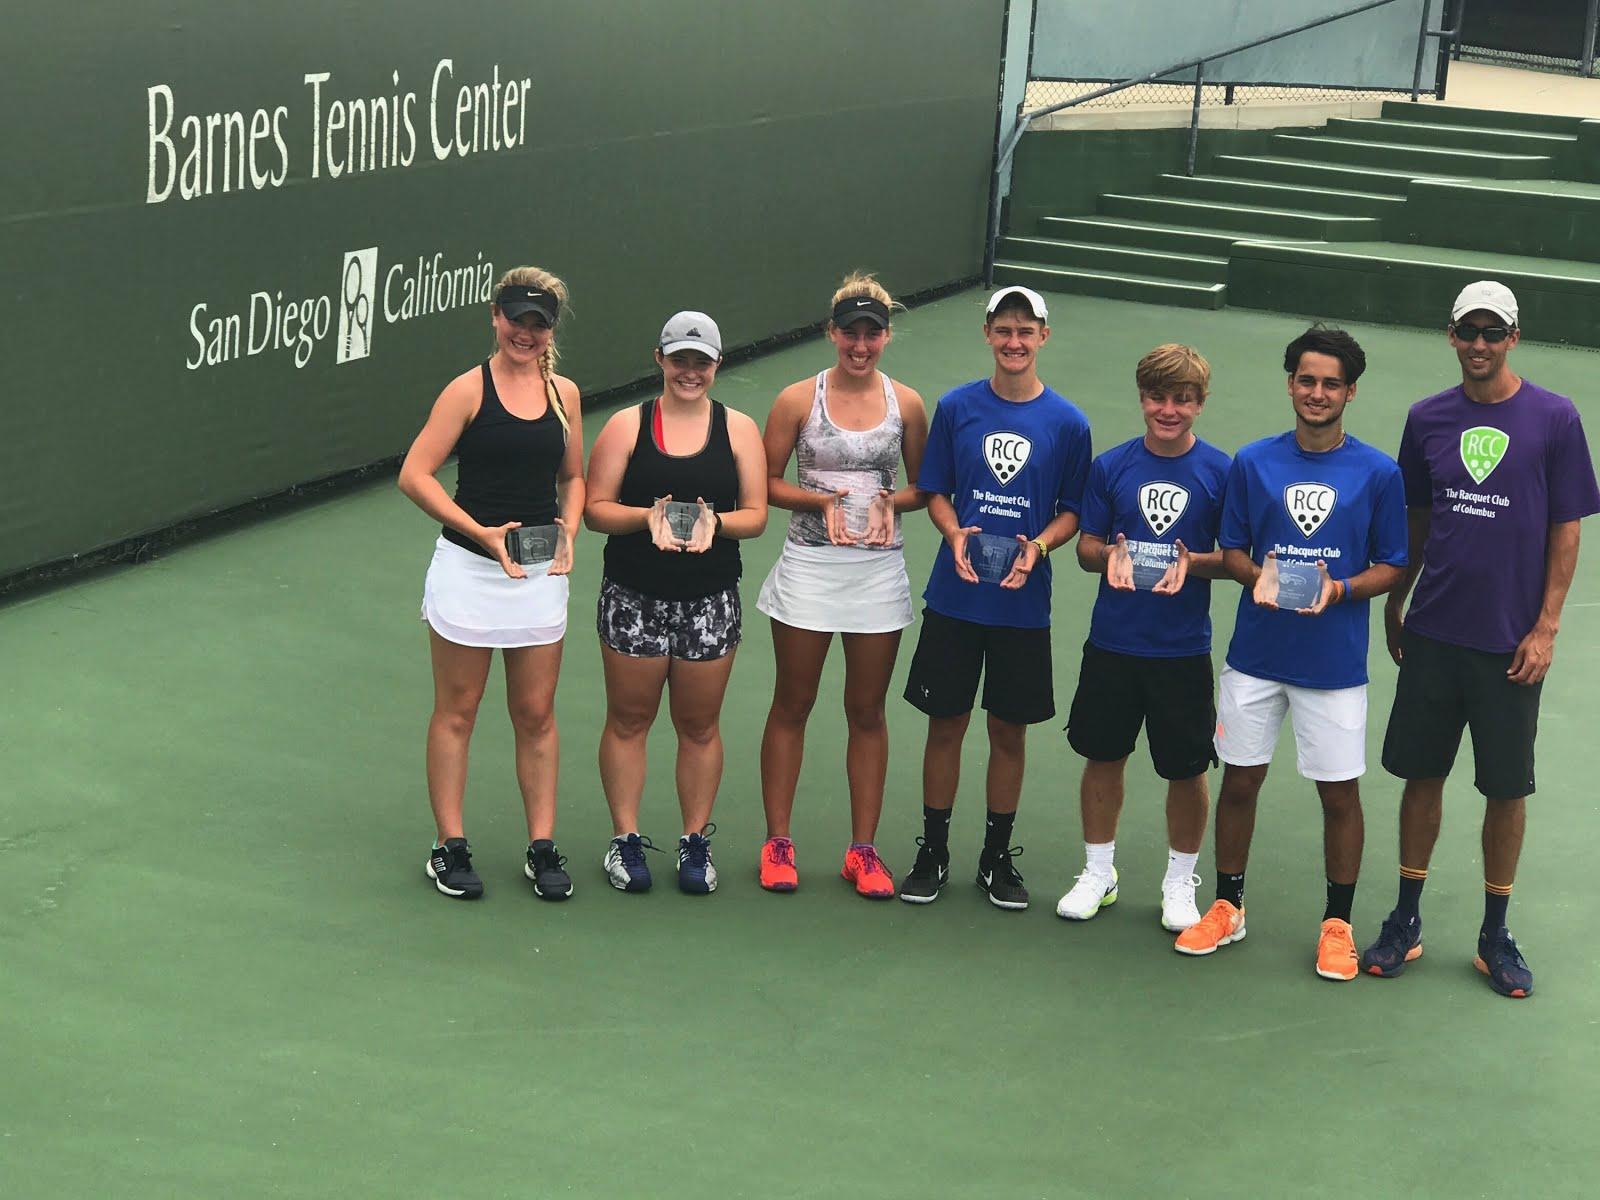 Tennisjuniorer i vm semifinal